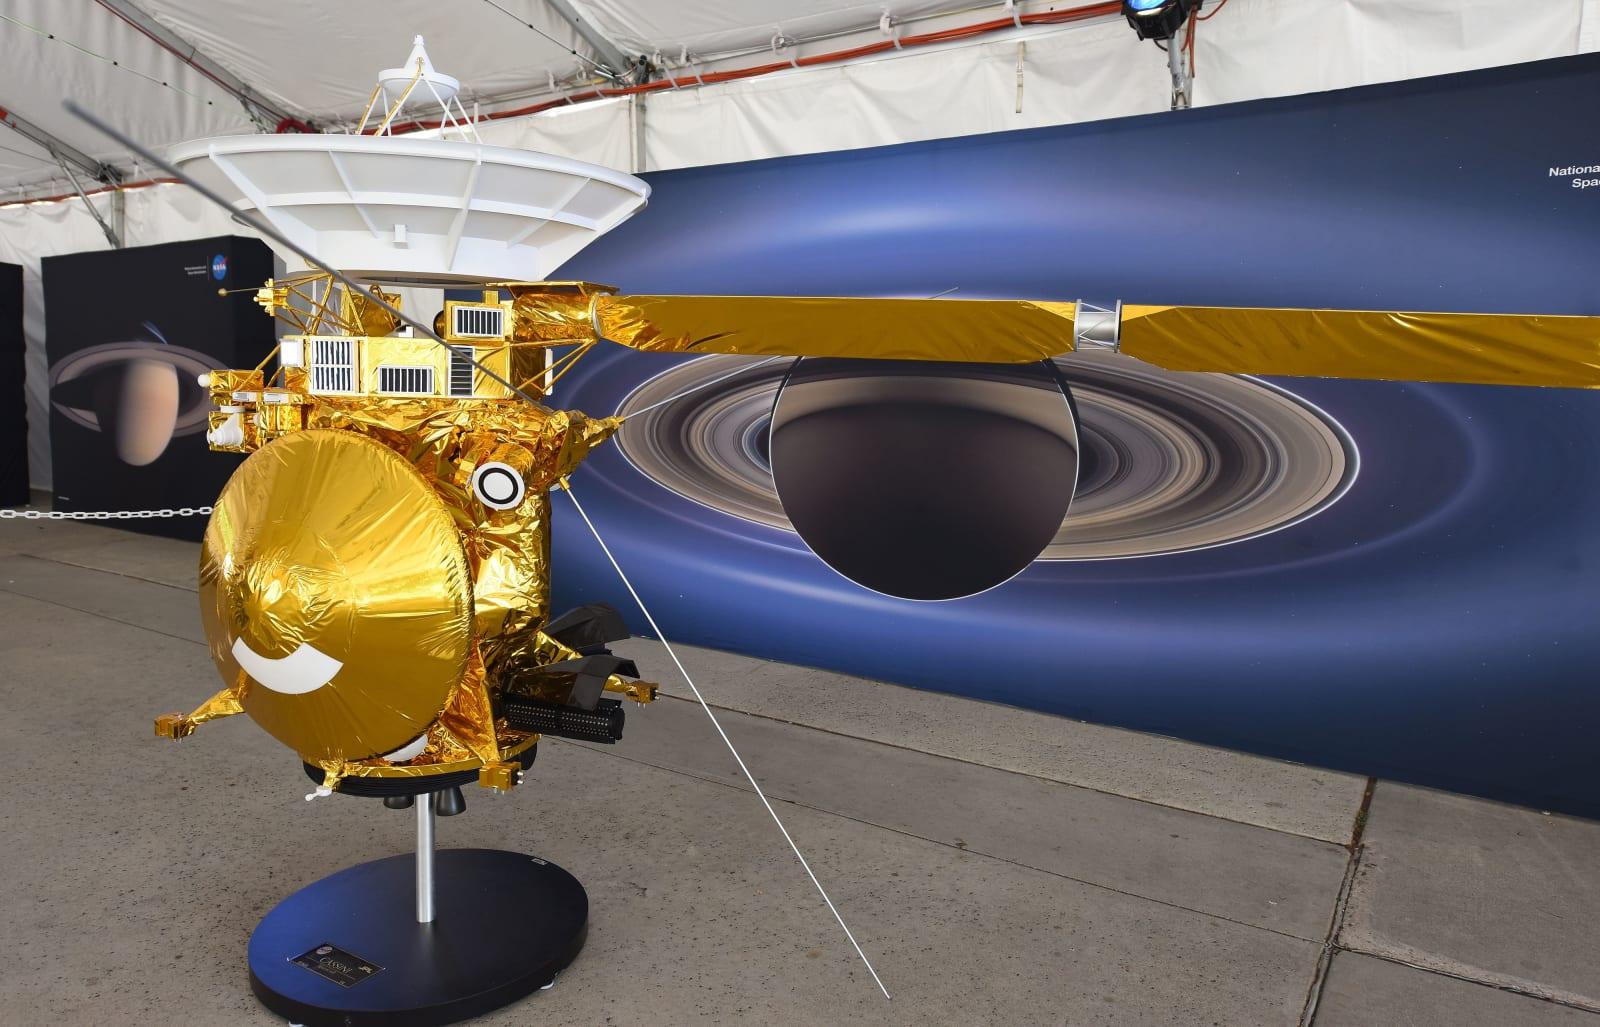 US-EUROPE-SPACE-ASTRONOMY-CASSINI